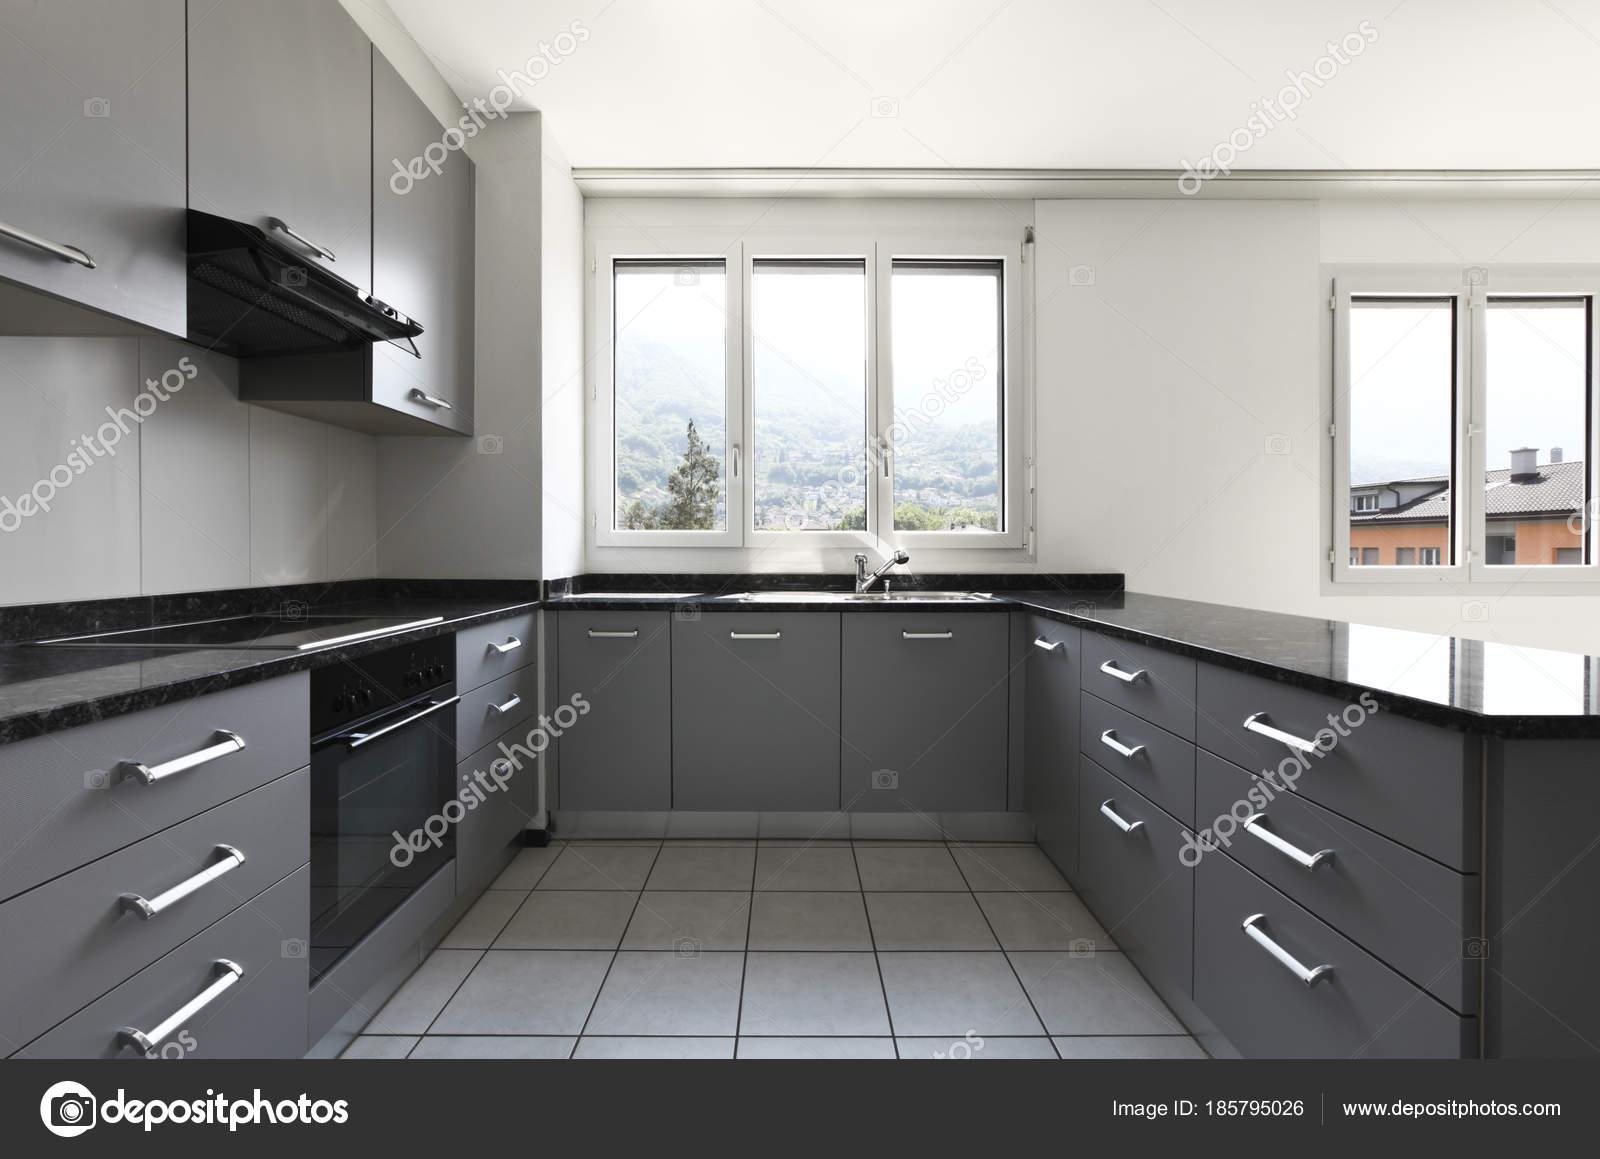 Keuken Schiereiland Met : Keukens assen fris keuken schiereiland met bar u atumre